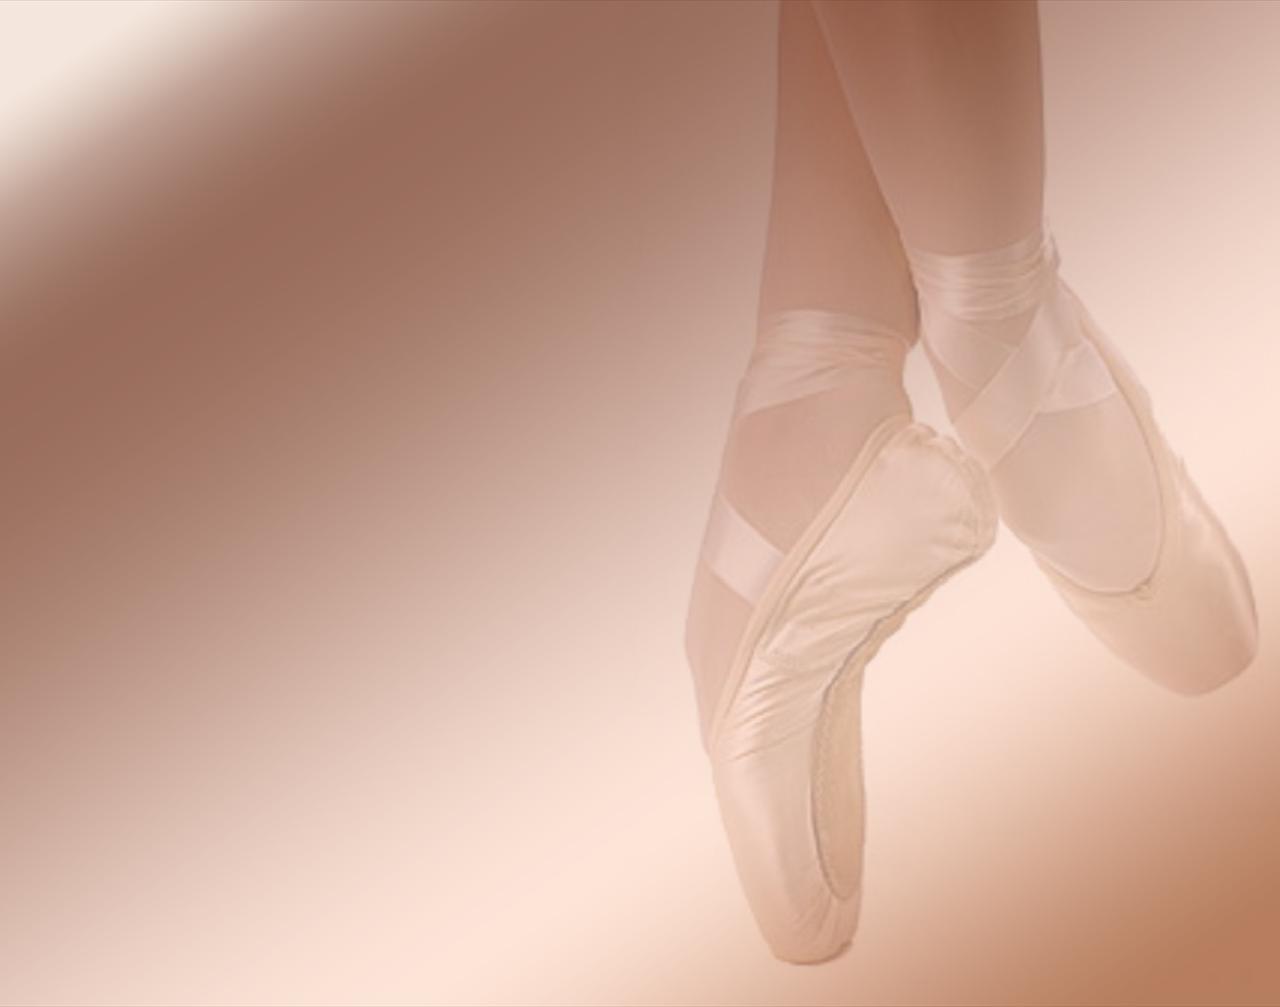 bfcacfcdde-pink-ballet-shoes-backgrounds-wallpaper-wp3603318